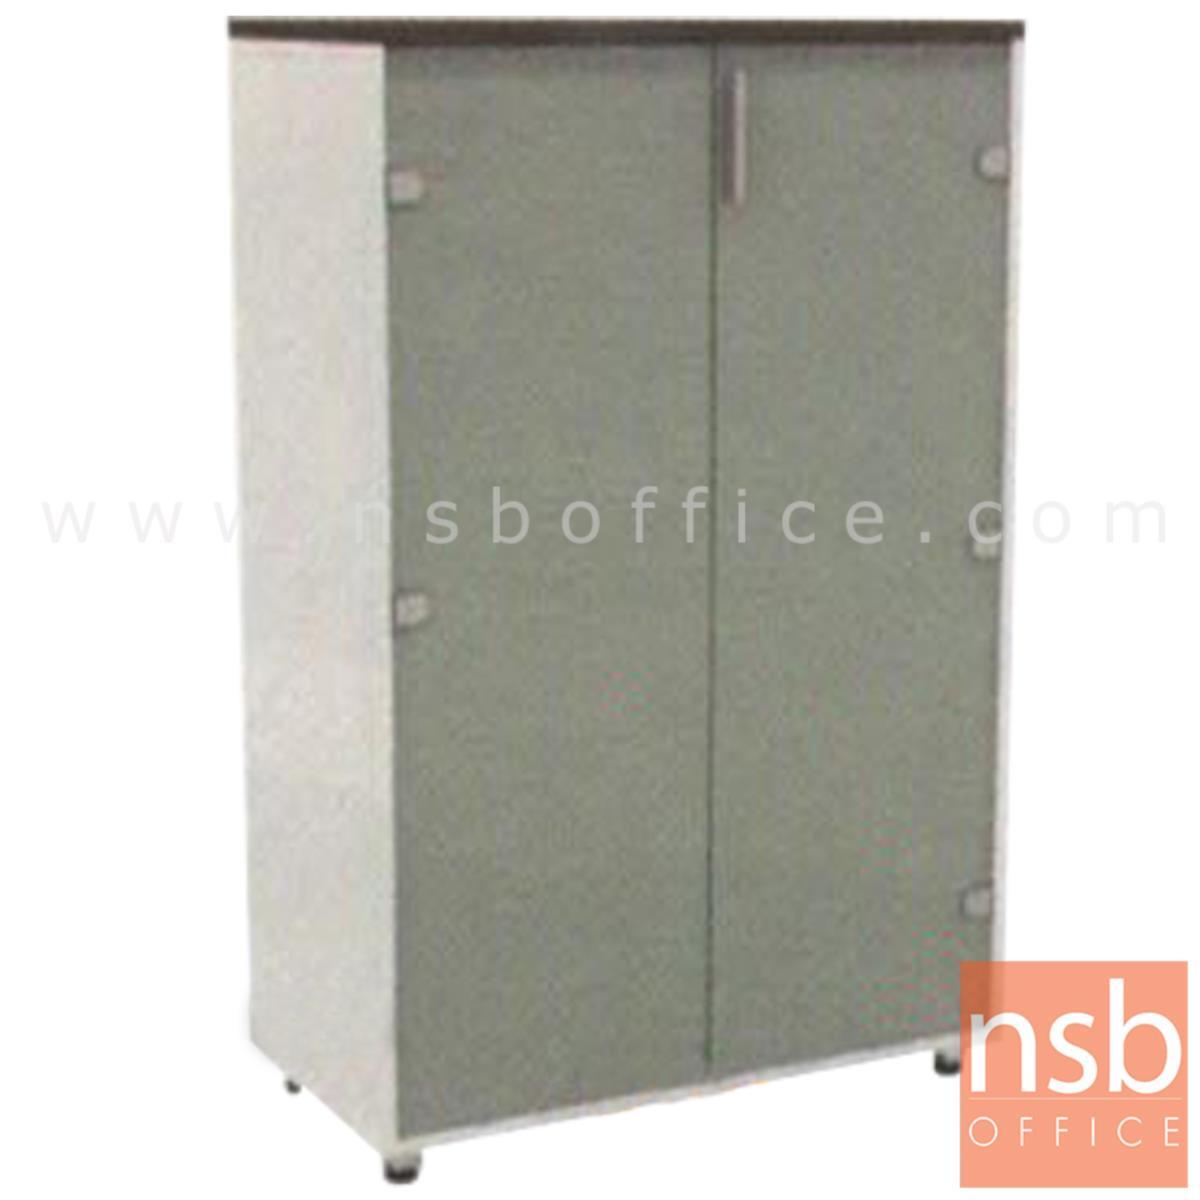 C05A006:ตู้เอกสาร สูง 125 cm. บานเปิดกระจก นุ่มนวลลดแรงกระแทก รุ่น HB-CI814  ขาชุบโครเมี่ยม